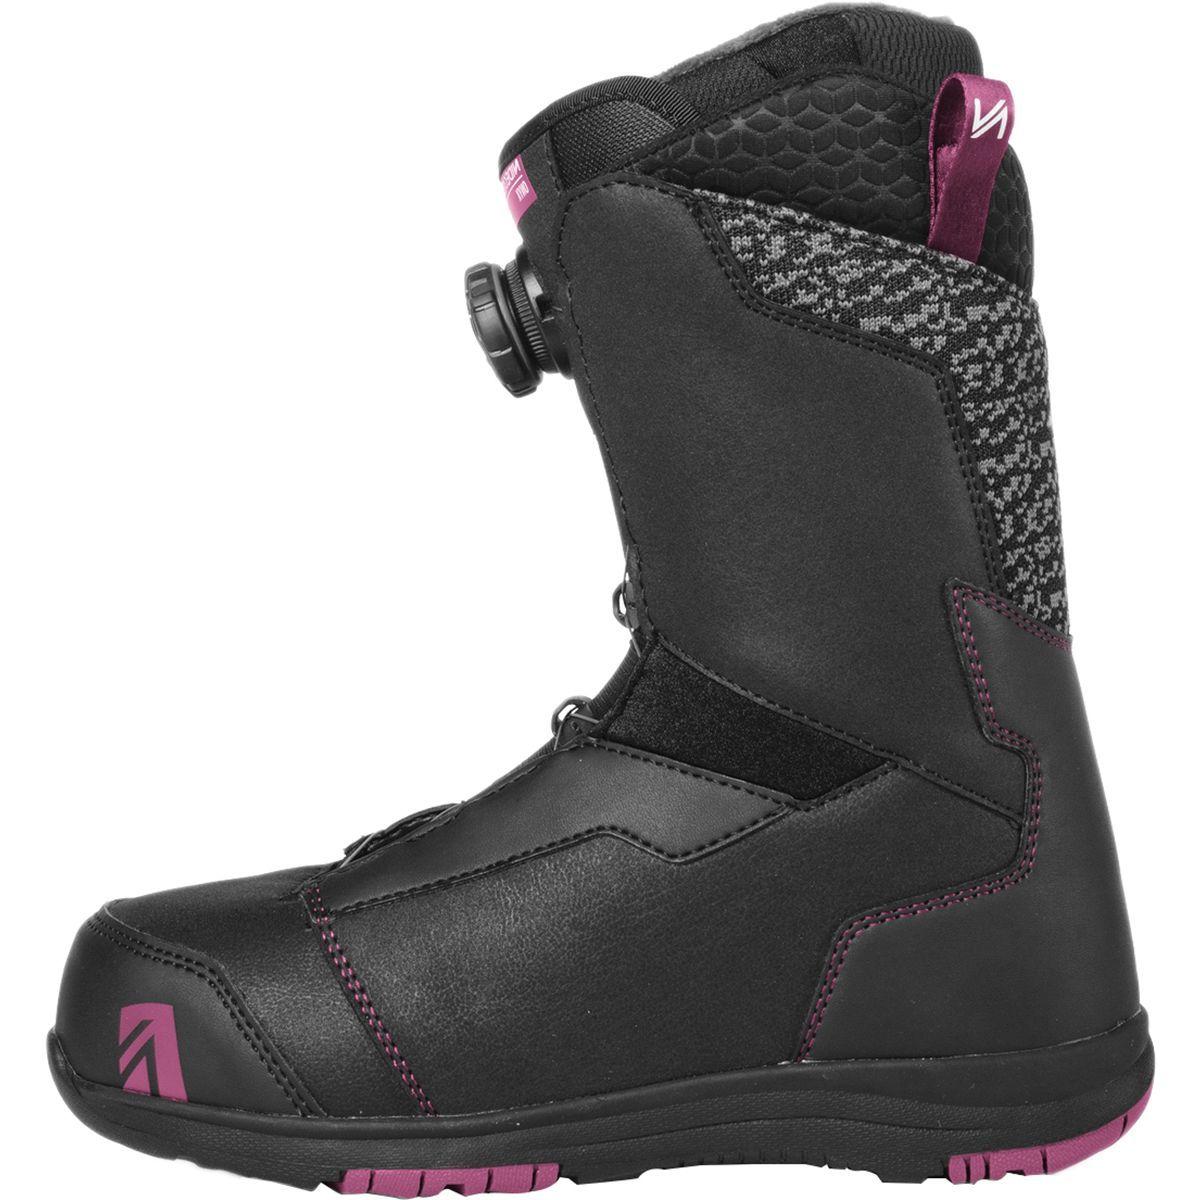 Nidecker x Flow Onyx Boa Coiler Snowboard Boot - Women's